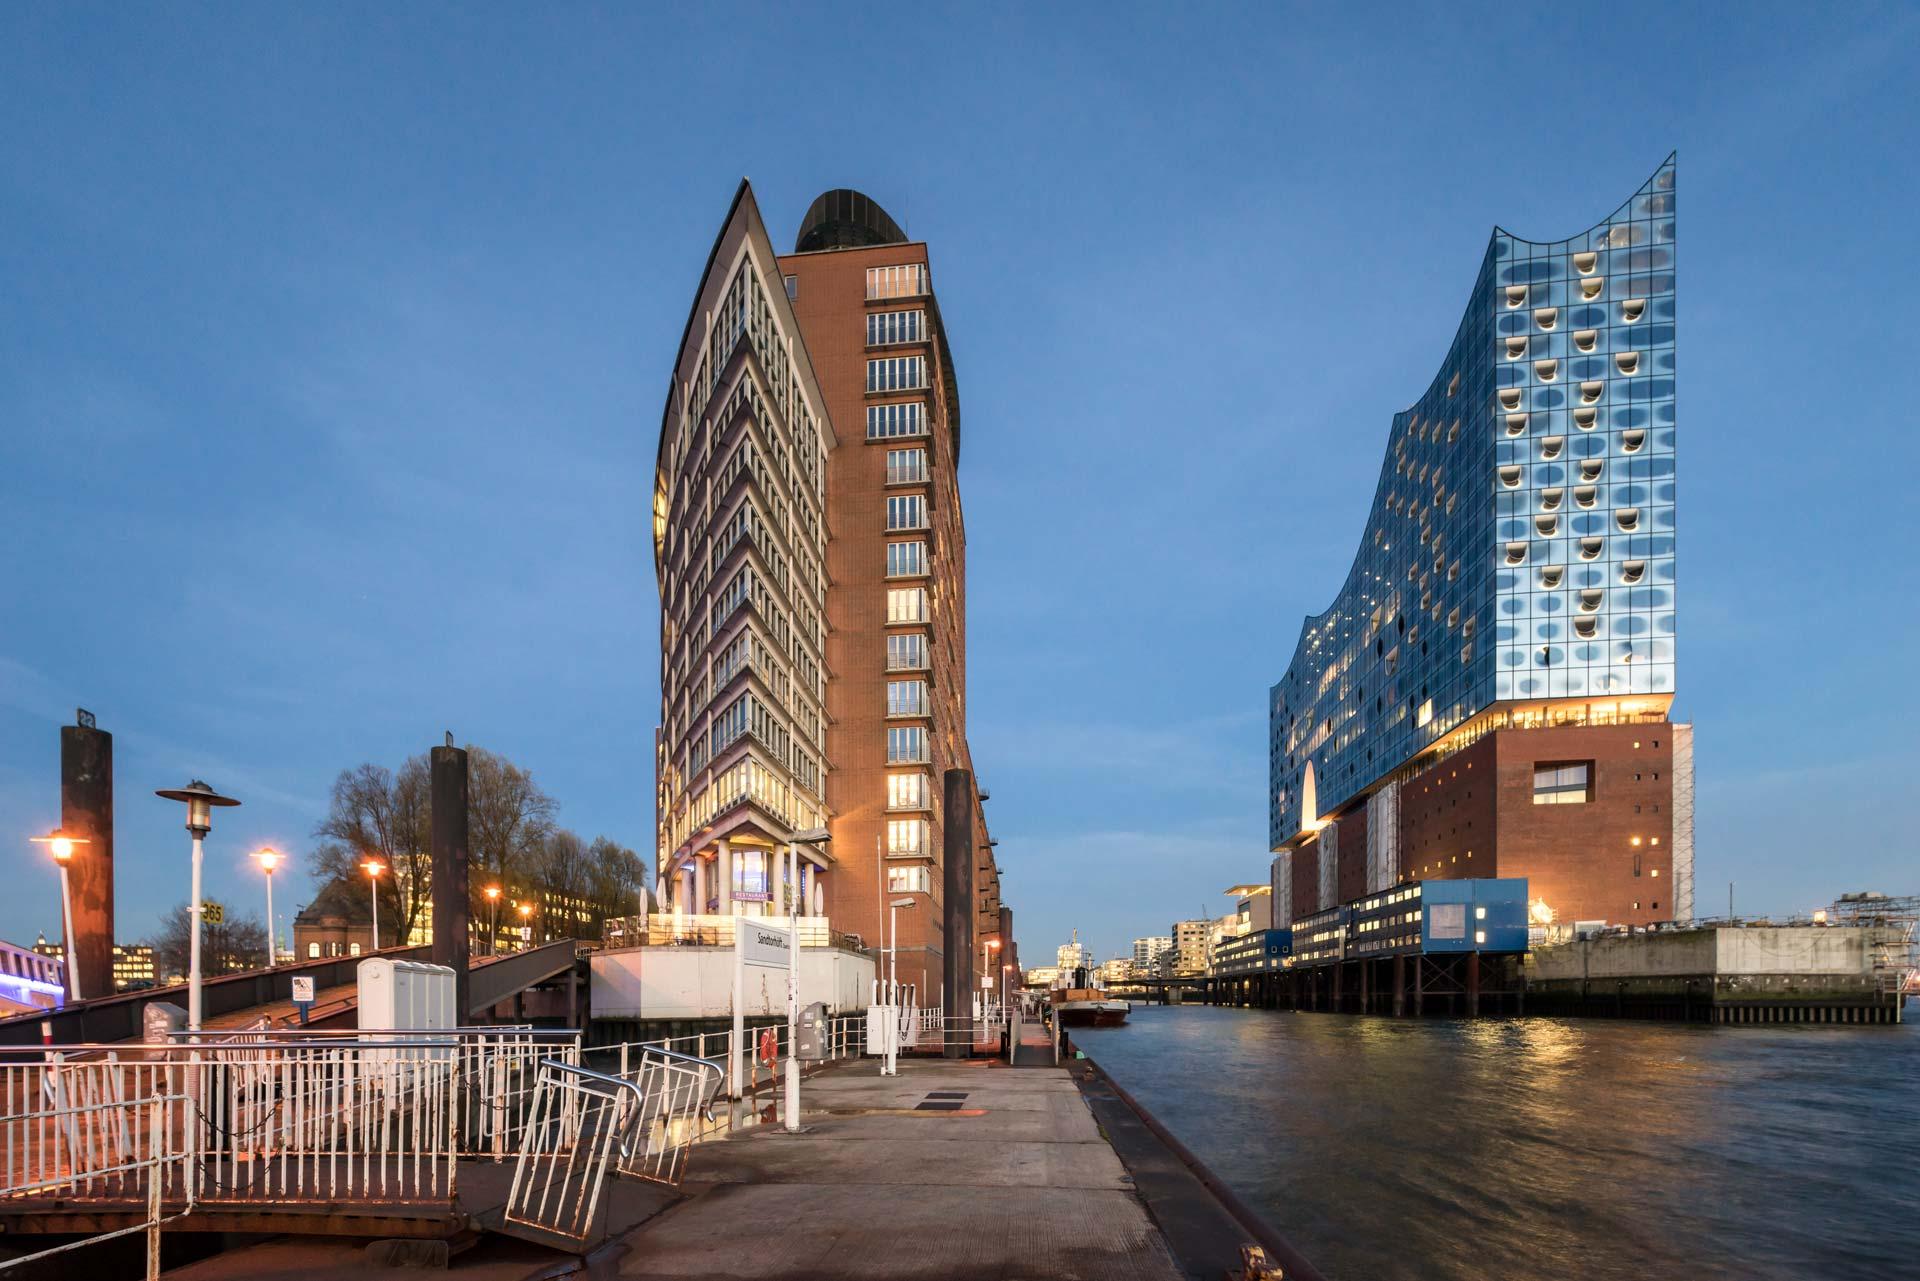 Architekturfotografie Hamburg architekturfotografie köln archiv martin gaissert hanseatic